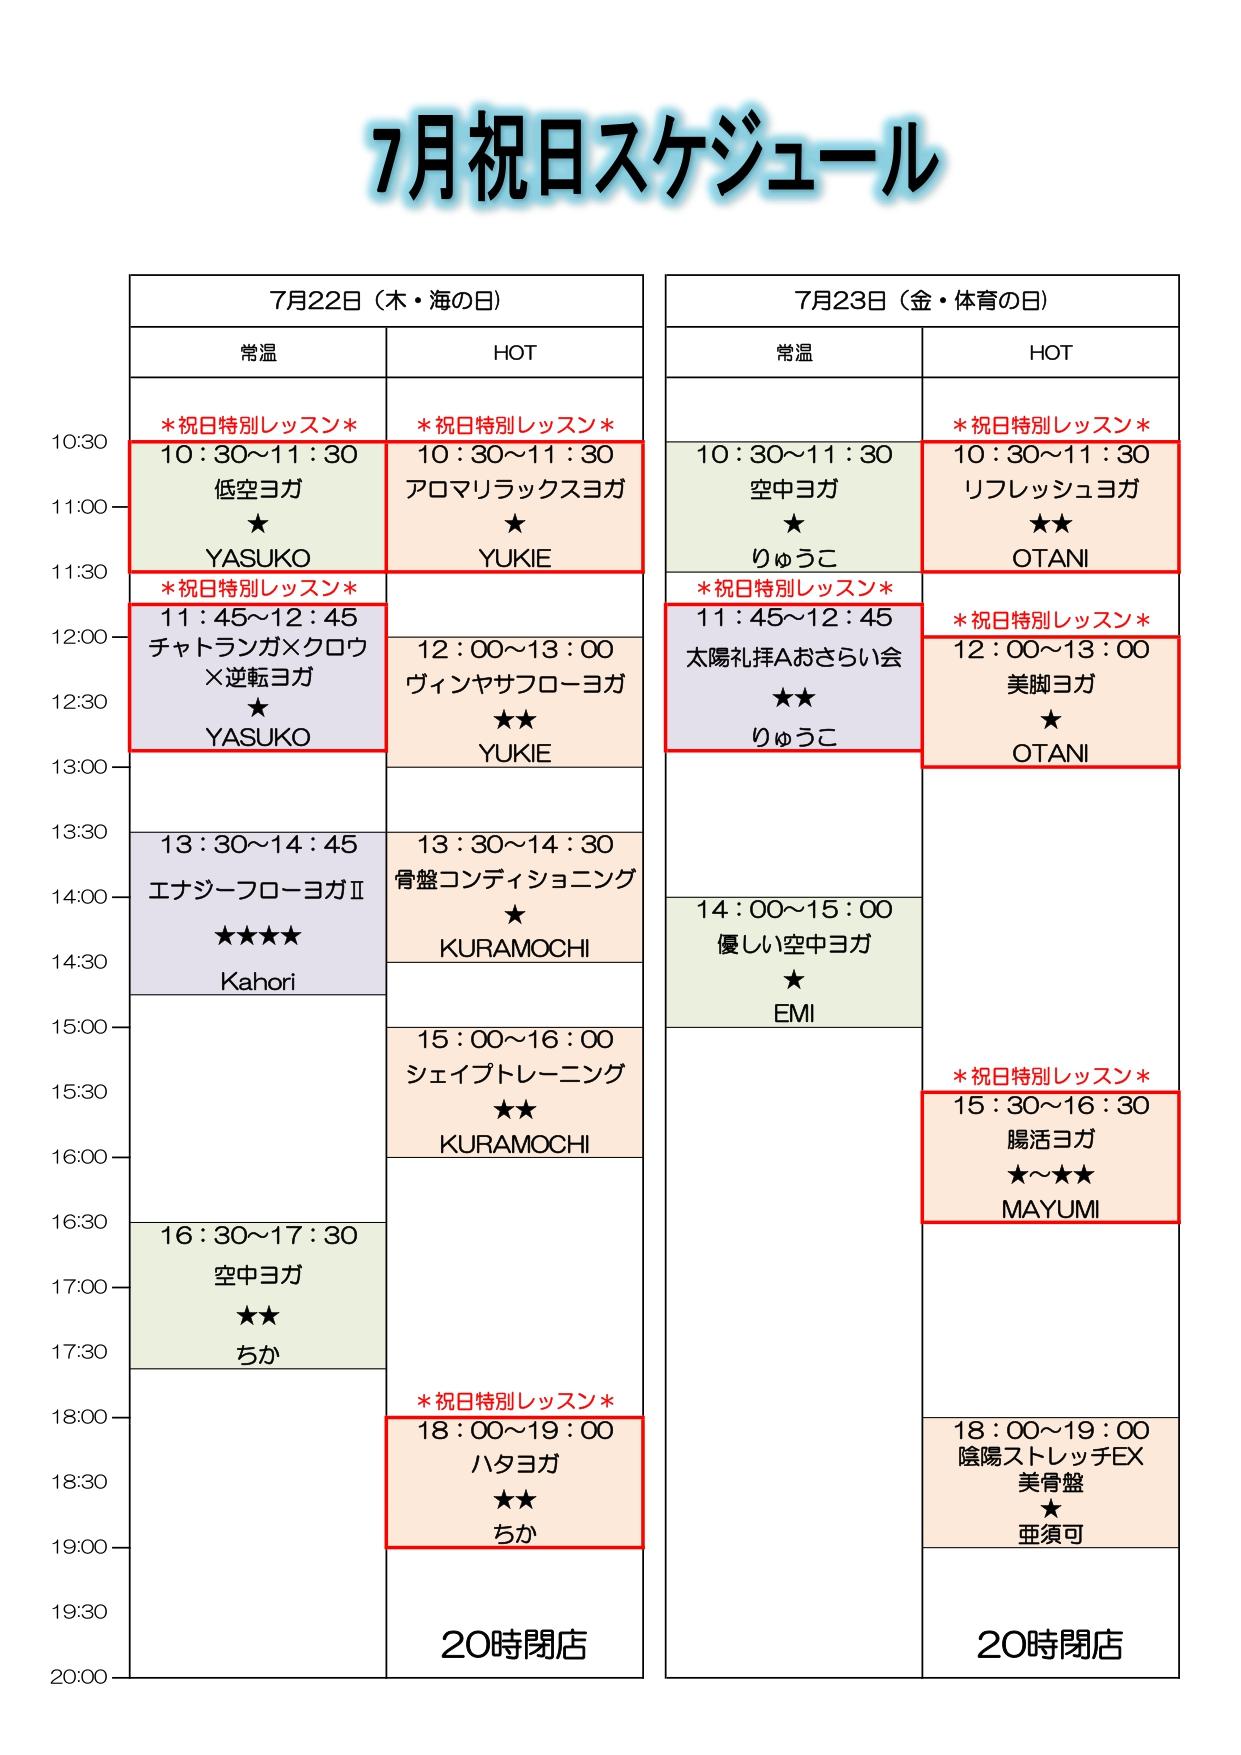 【HP用】2021年7月祝日五香スケジュール copy_page-0001